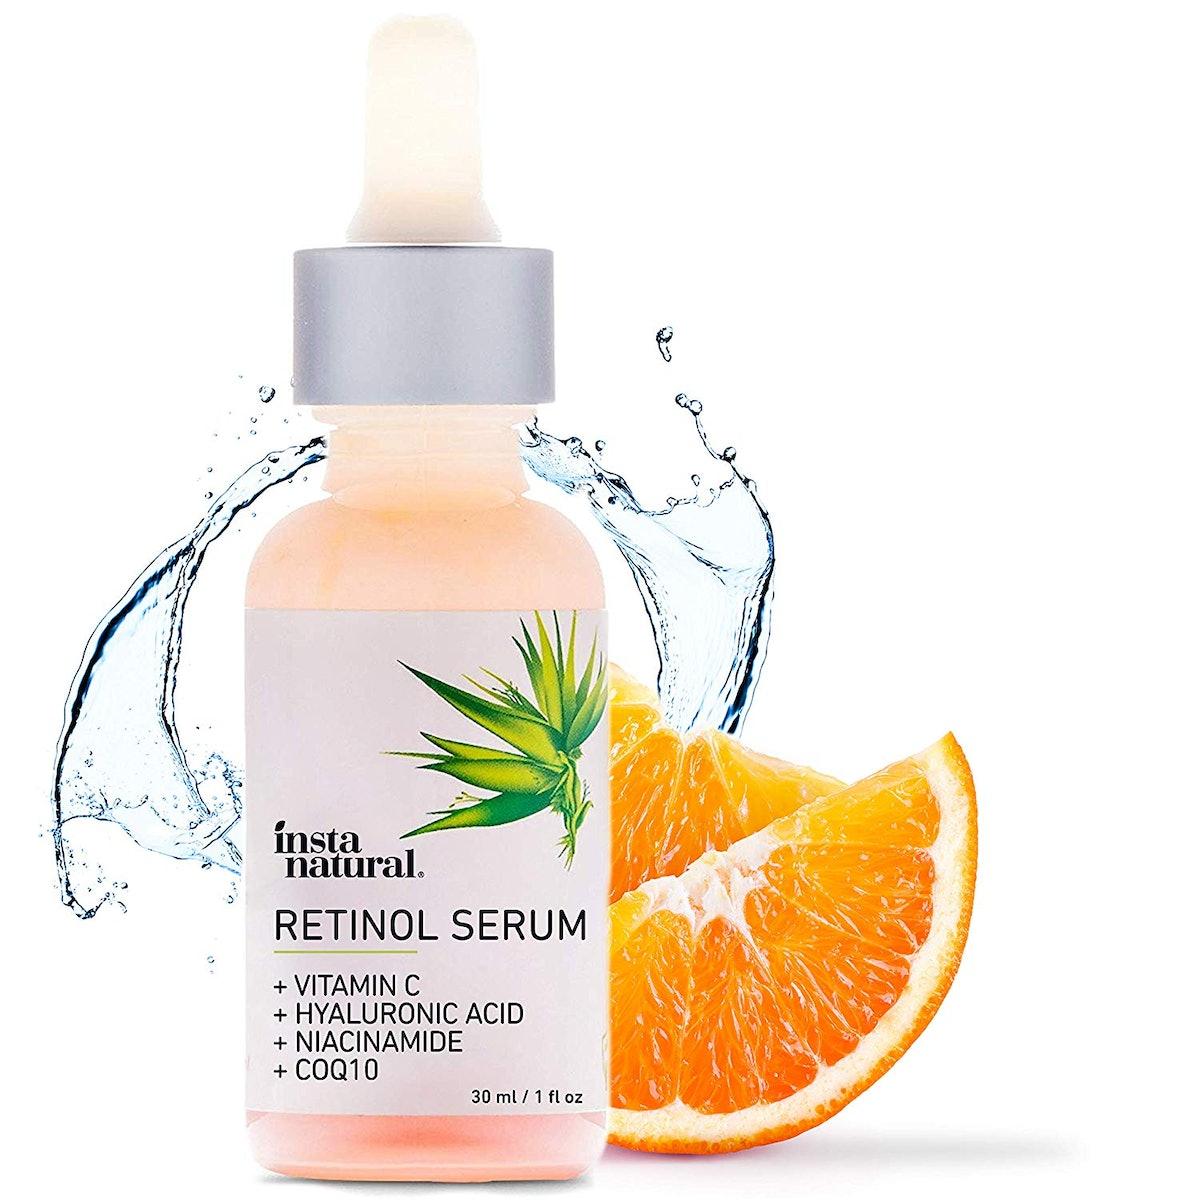 InstaNatural Retinol Serum